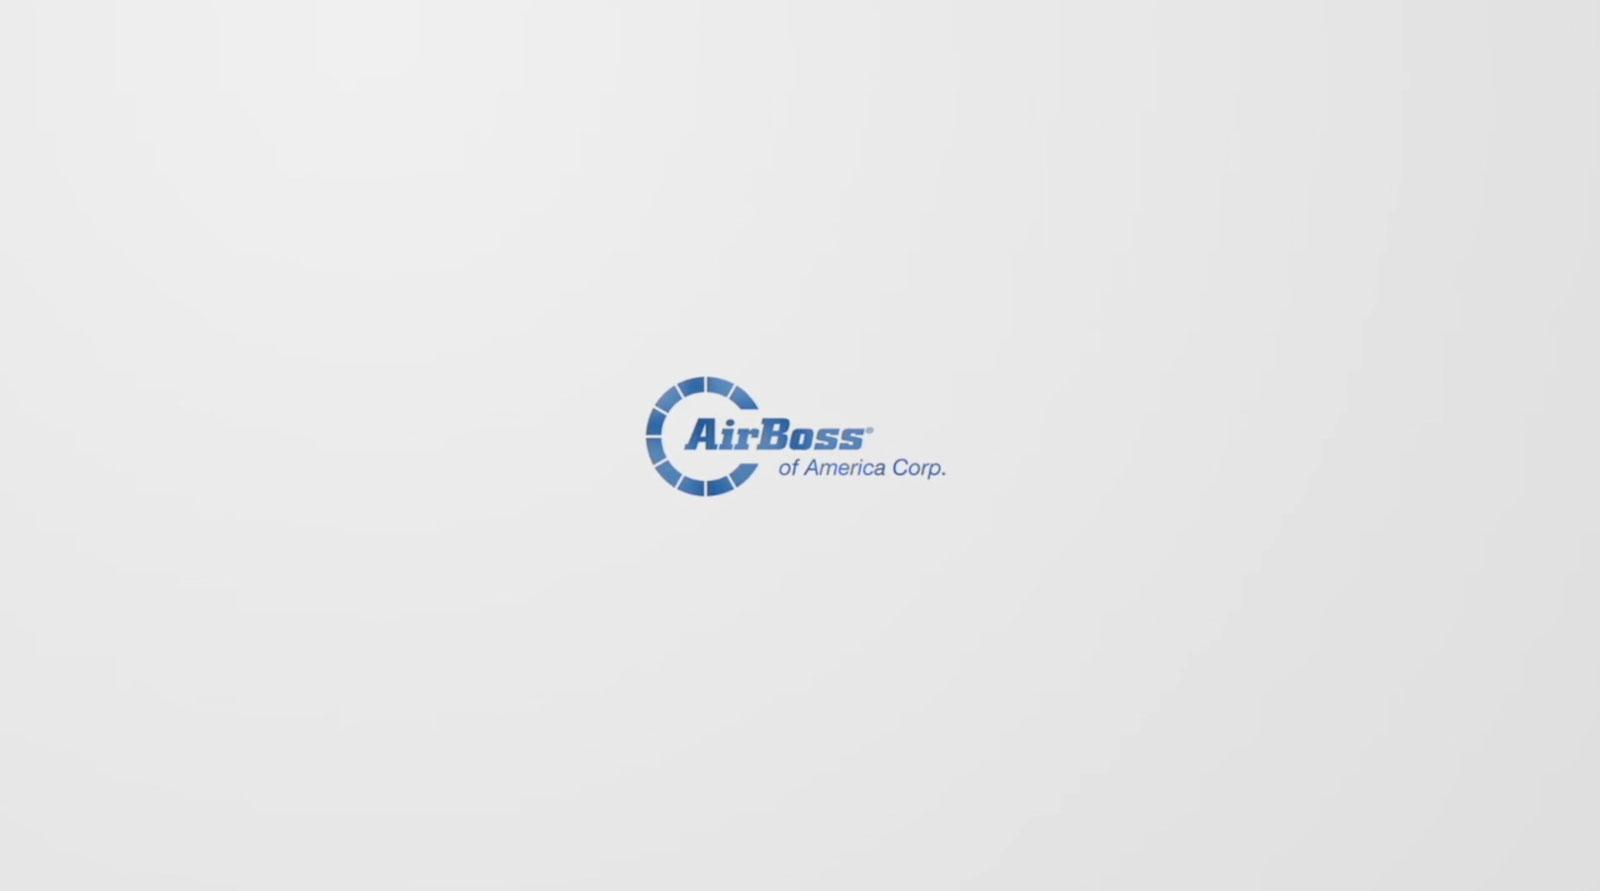 AirBoss video press release